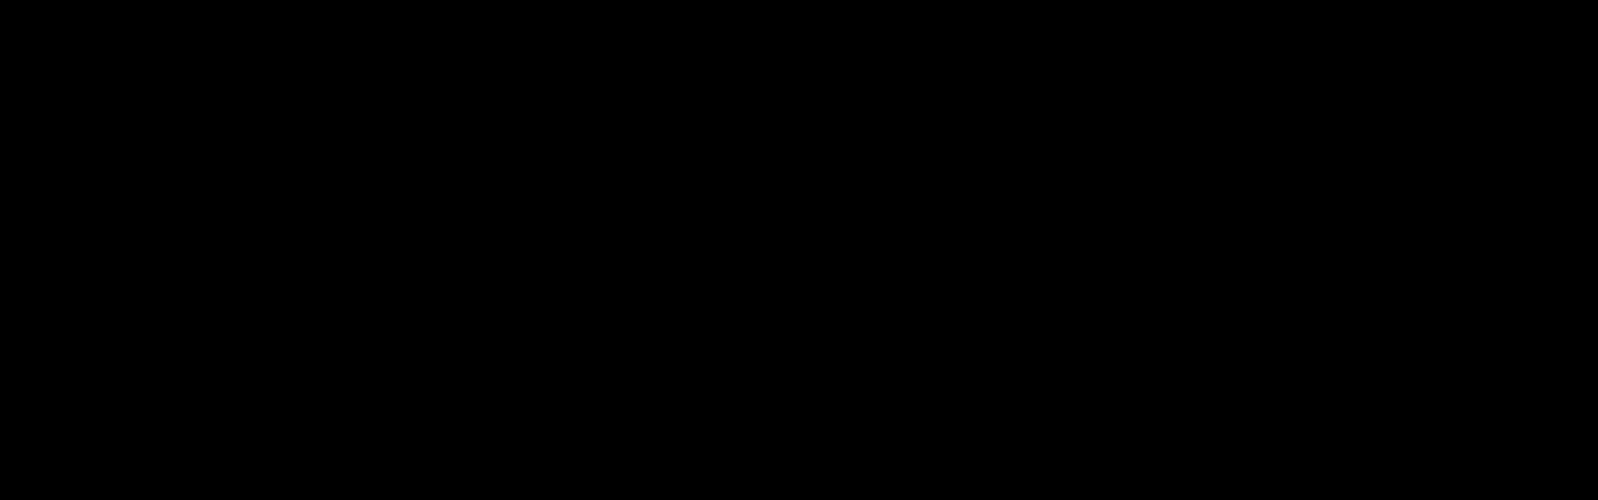 Dallas Skyline Black Outline 95